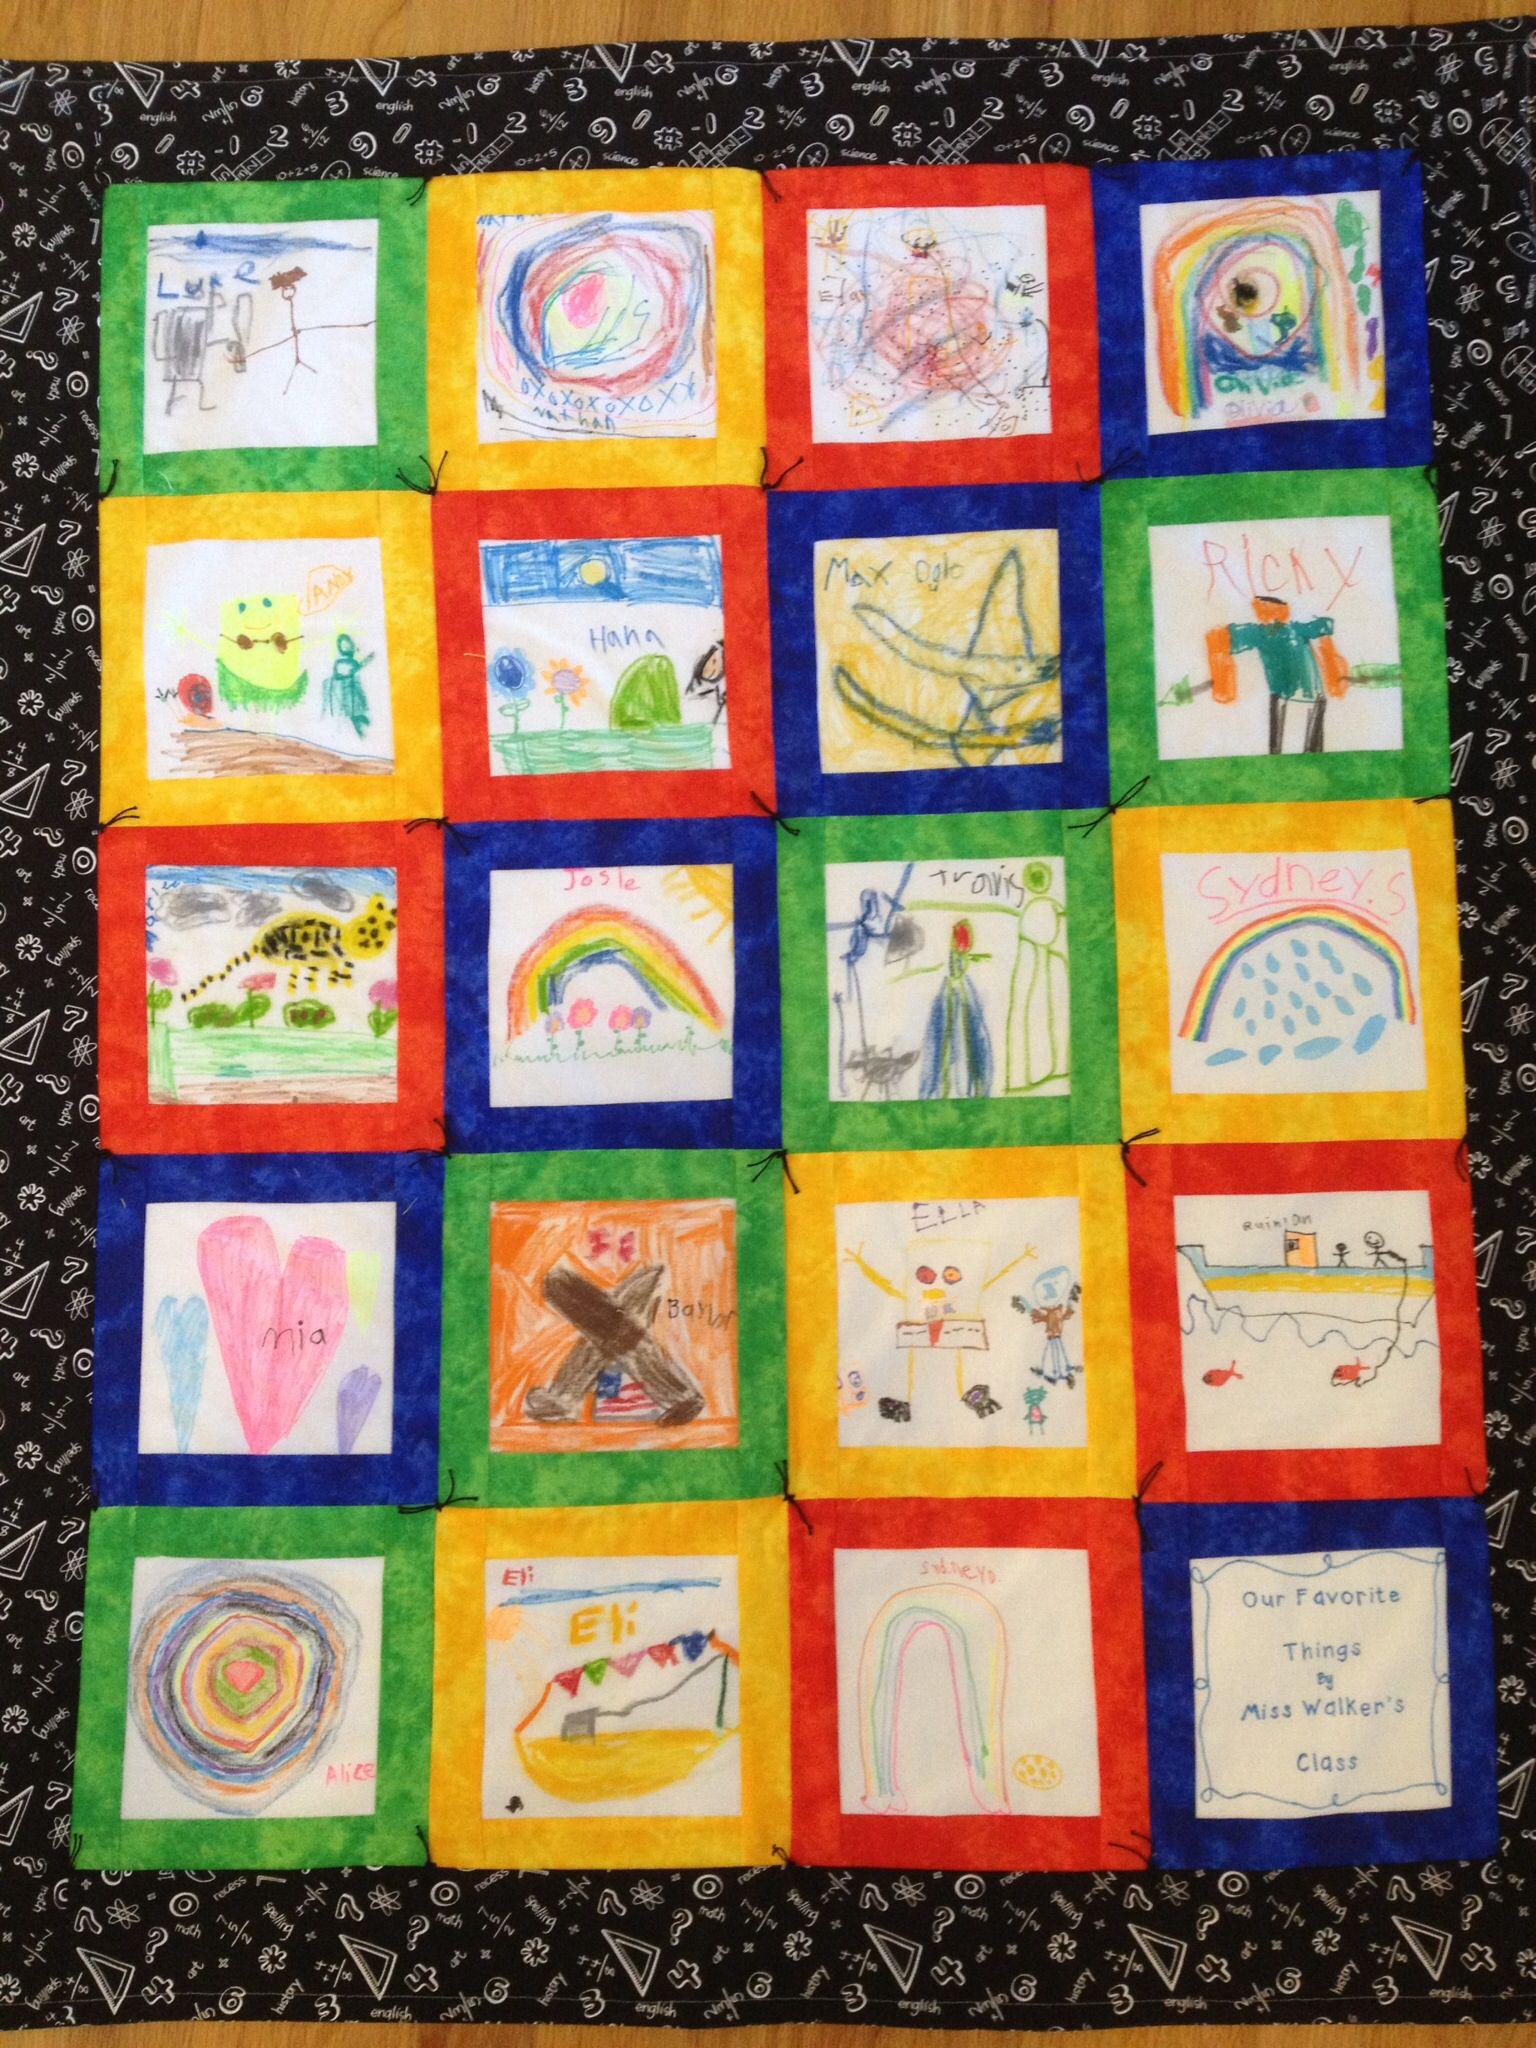 Classroom Quilt Themes : Classroom quilt fabric pastels ideas pinterest